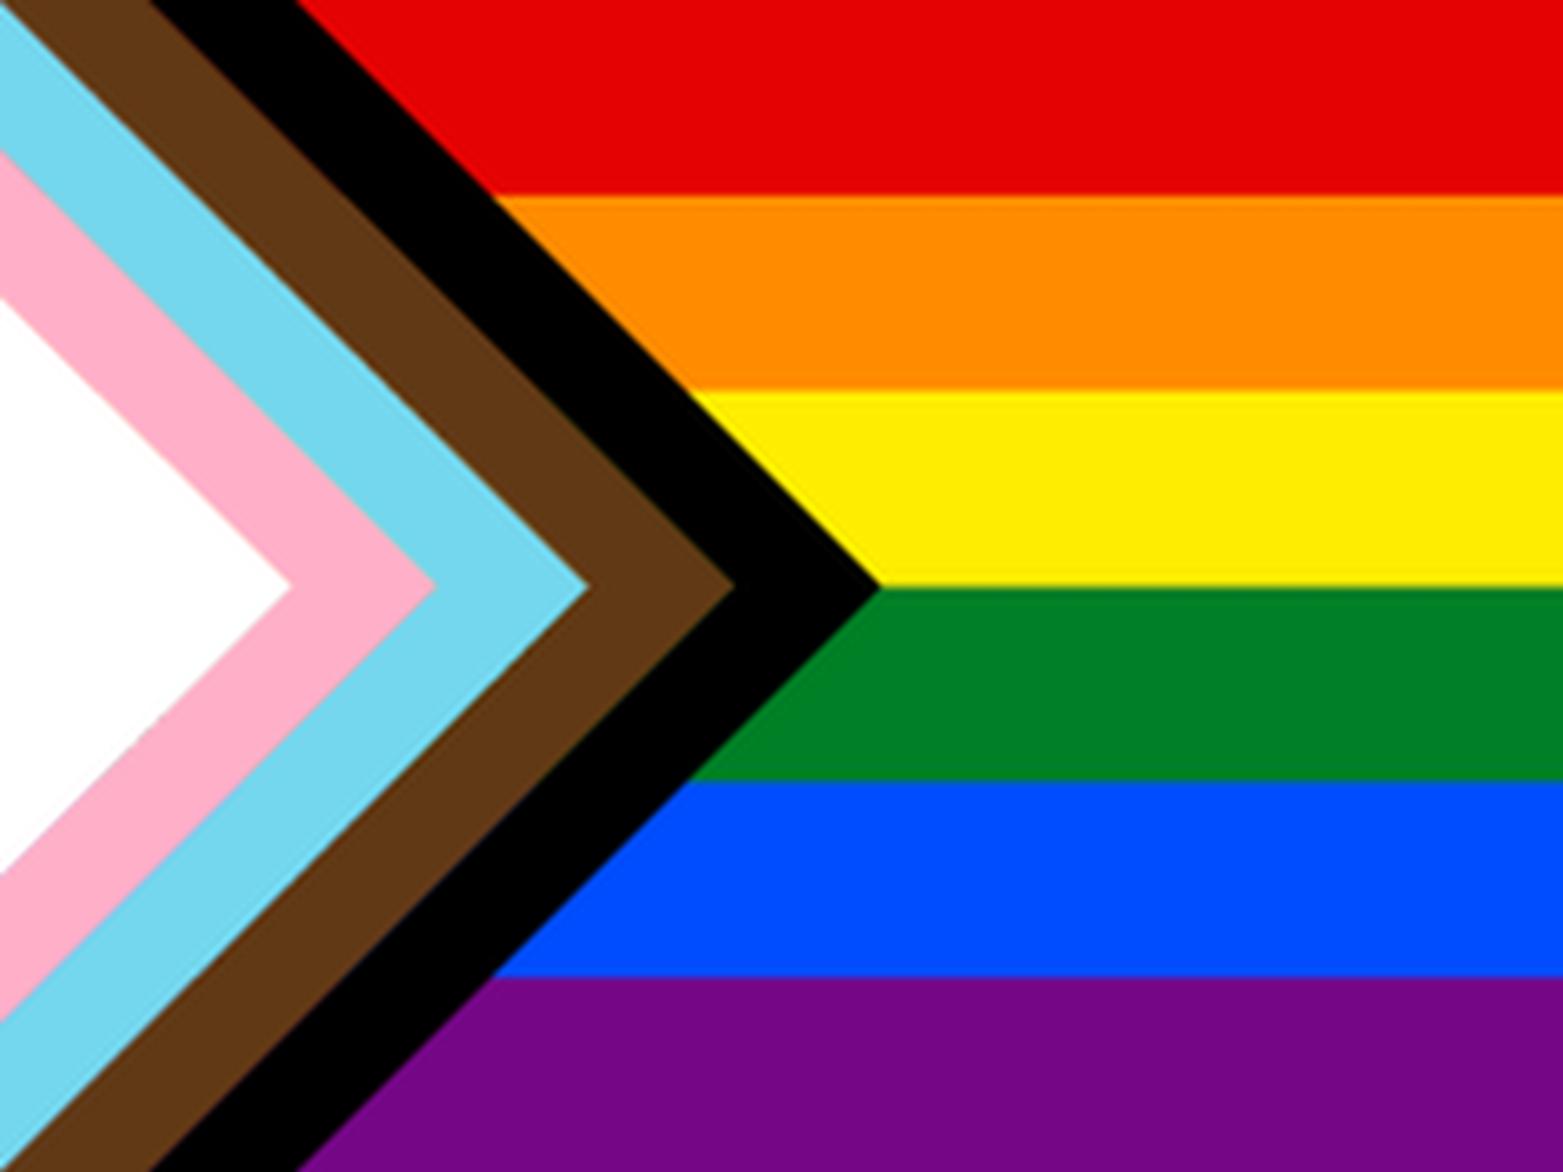 Campaigns: Progress Pride Crossing